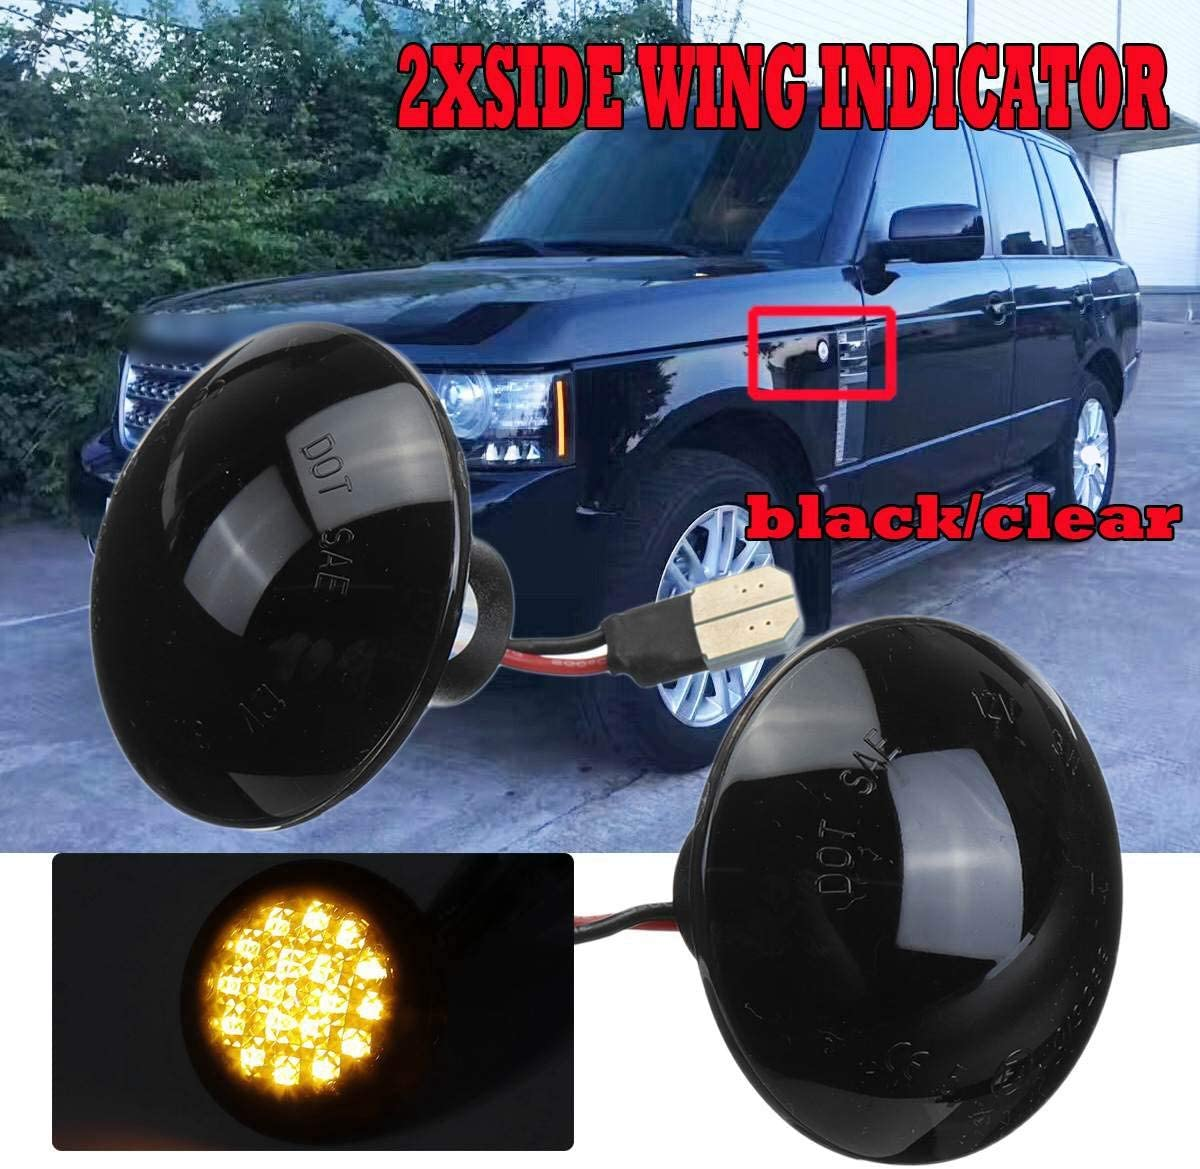 Tuneway Car Dynamic LED Ripetitore Laterale Indicatore di Direzione Indicatore Laterale Scorrevole Lampada Spia per Land Range Rover L322 2002-2012 Bianco